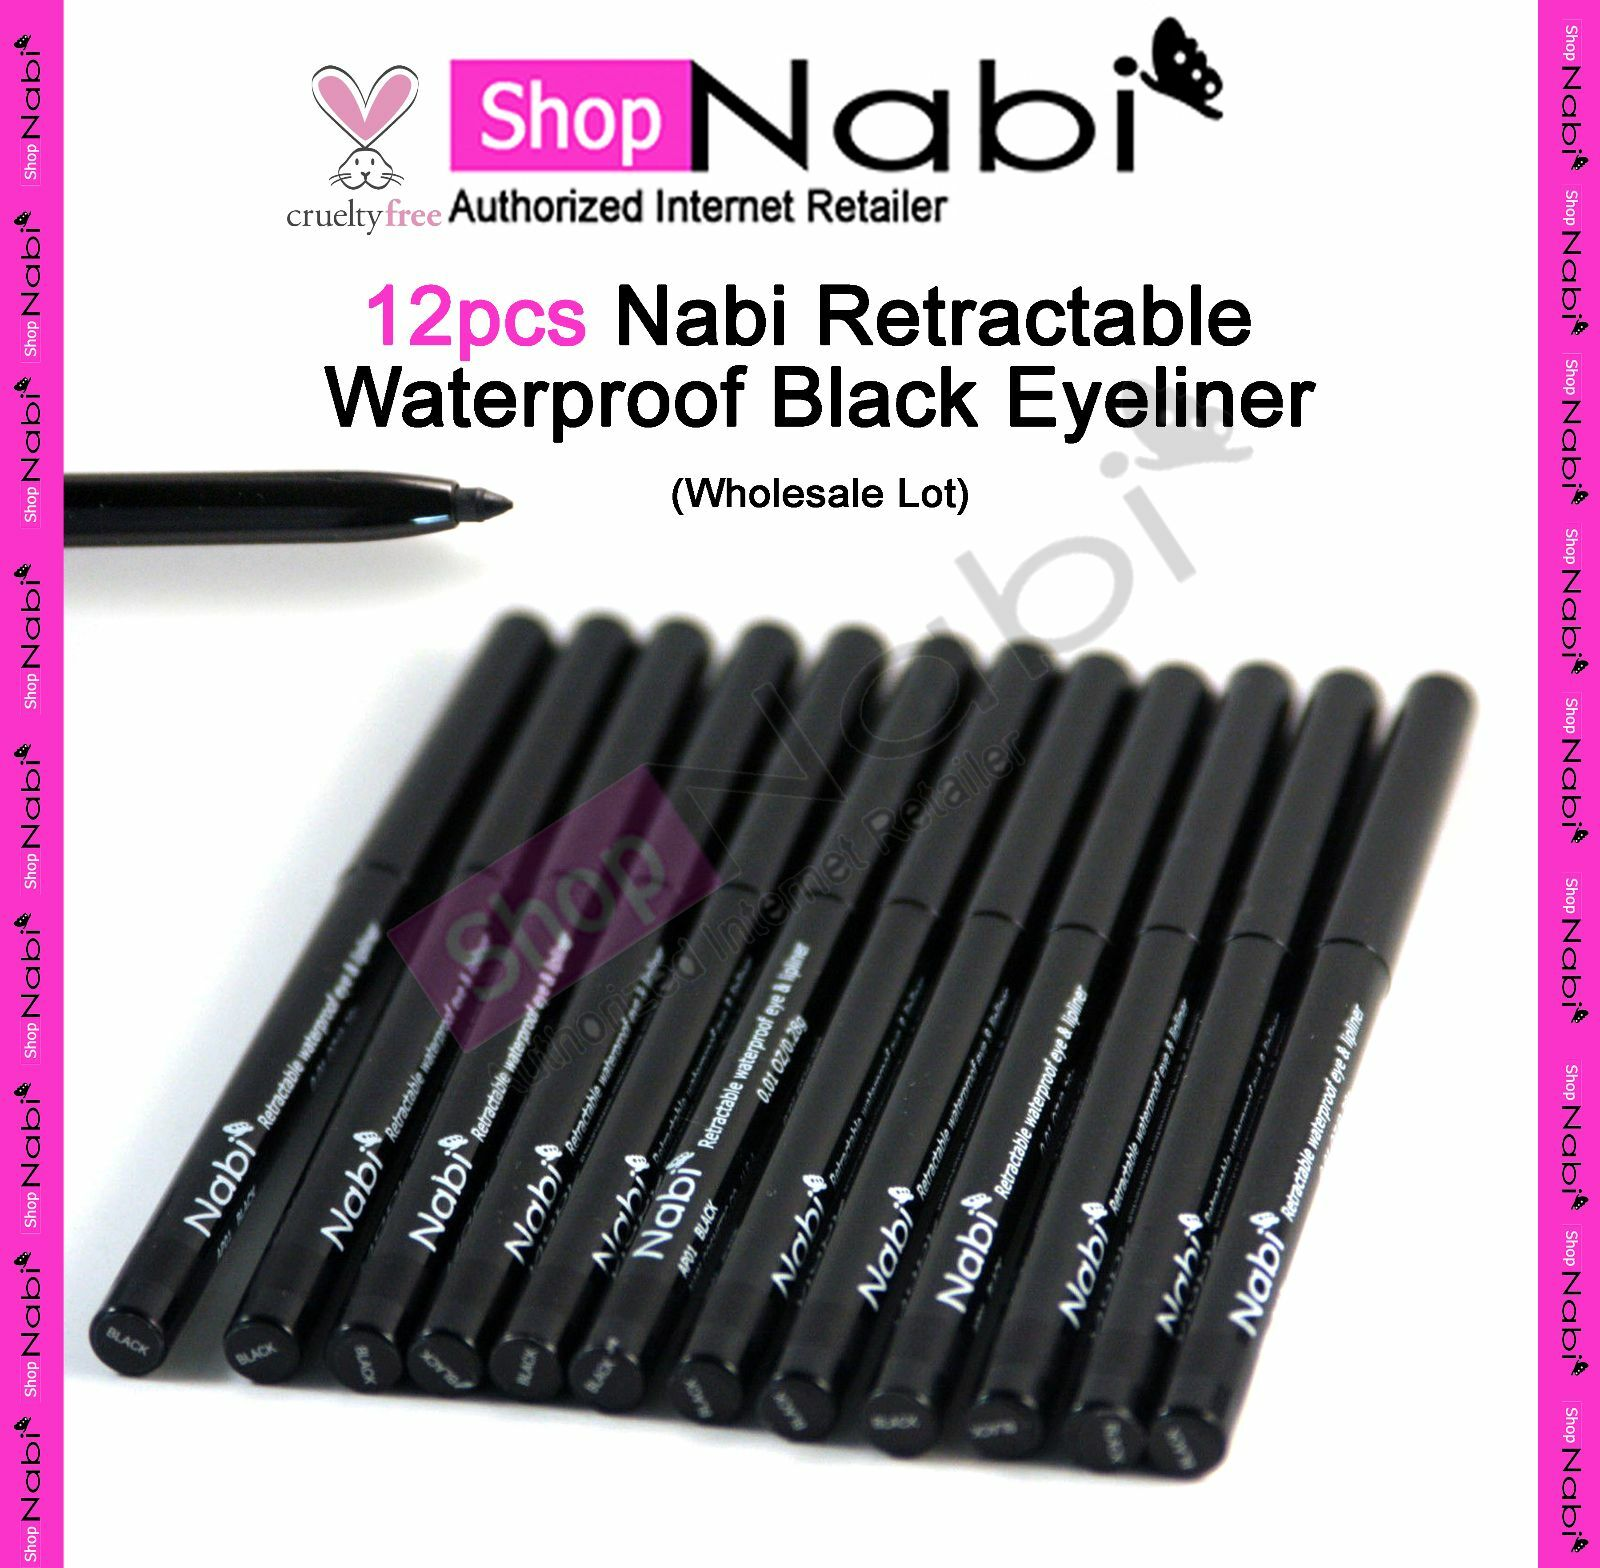 12pcs Nabi Retractable Waterproof  Black Eyeliner_cruelty Fr